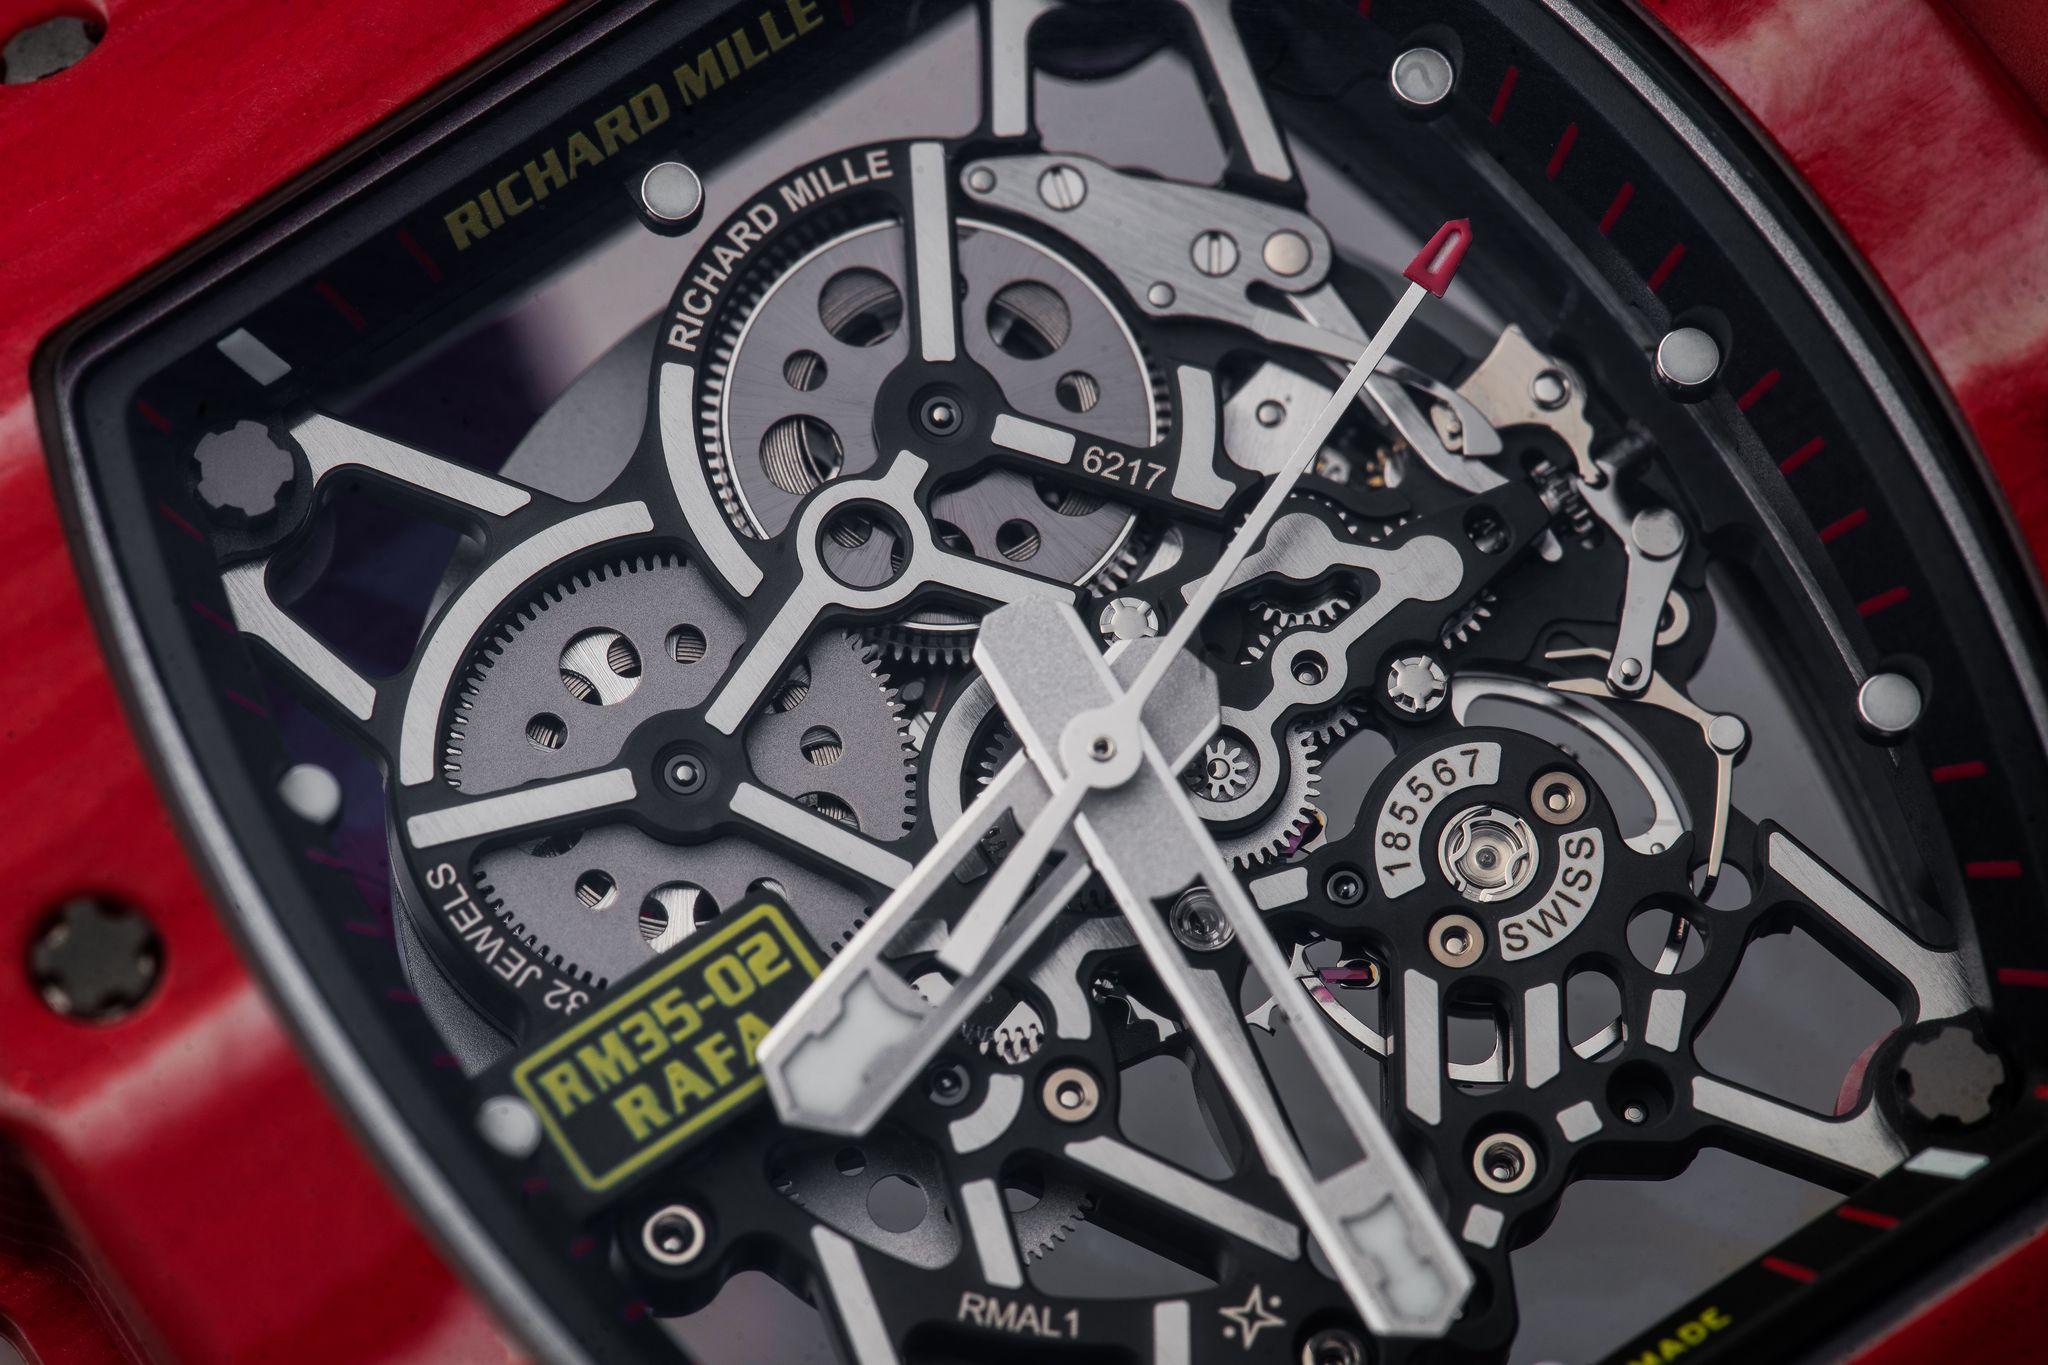 Watch Of The Week Richard Mille Rm 35 02 Rafael Nadal